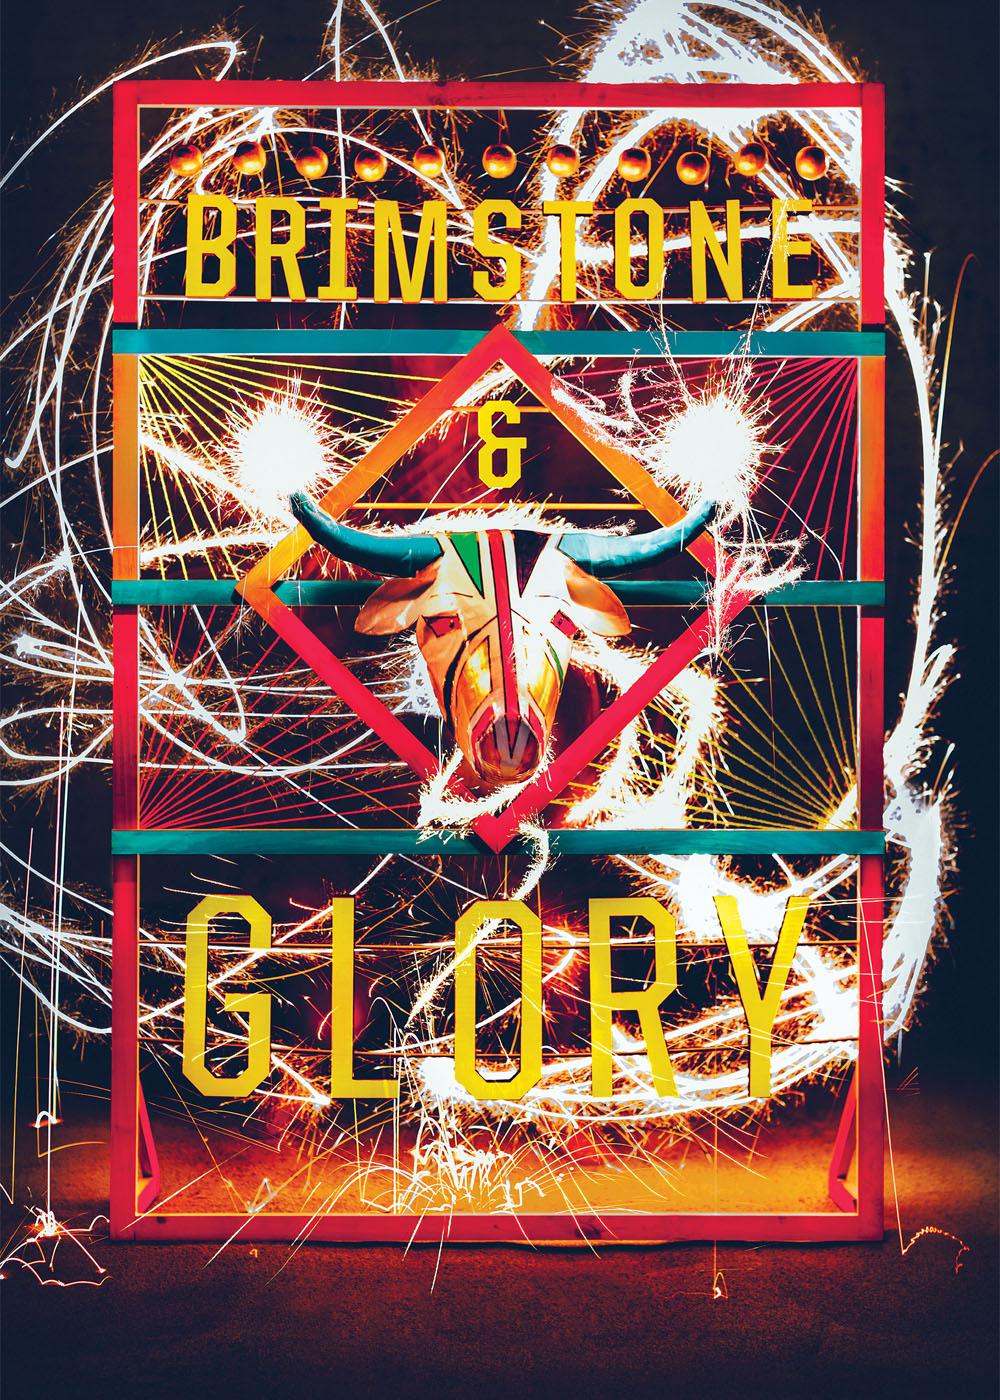 brimstoneglory_poster.jpg